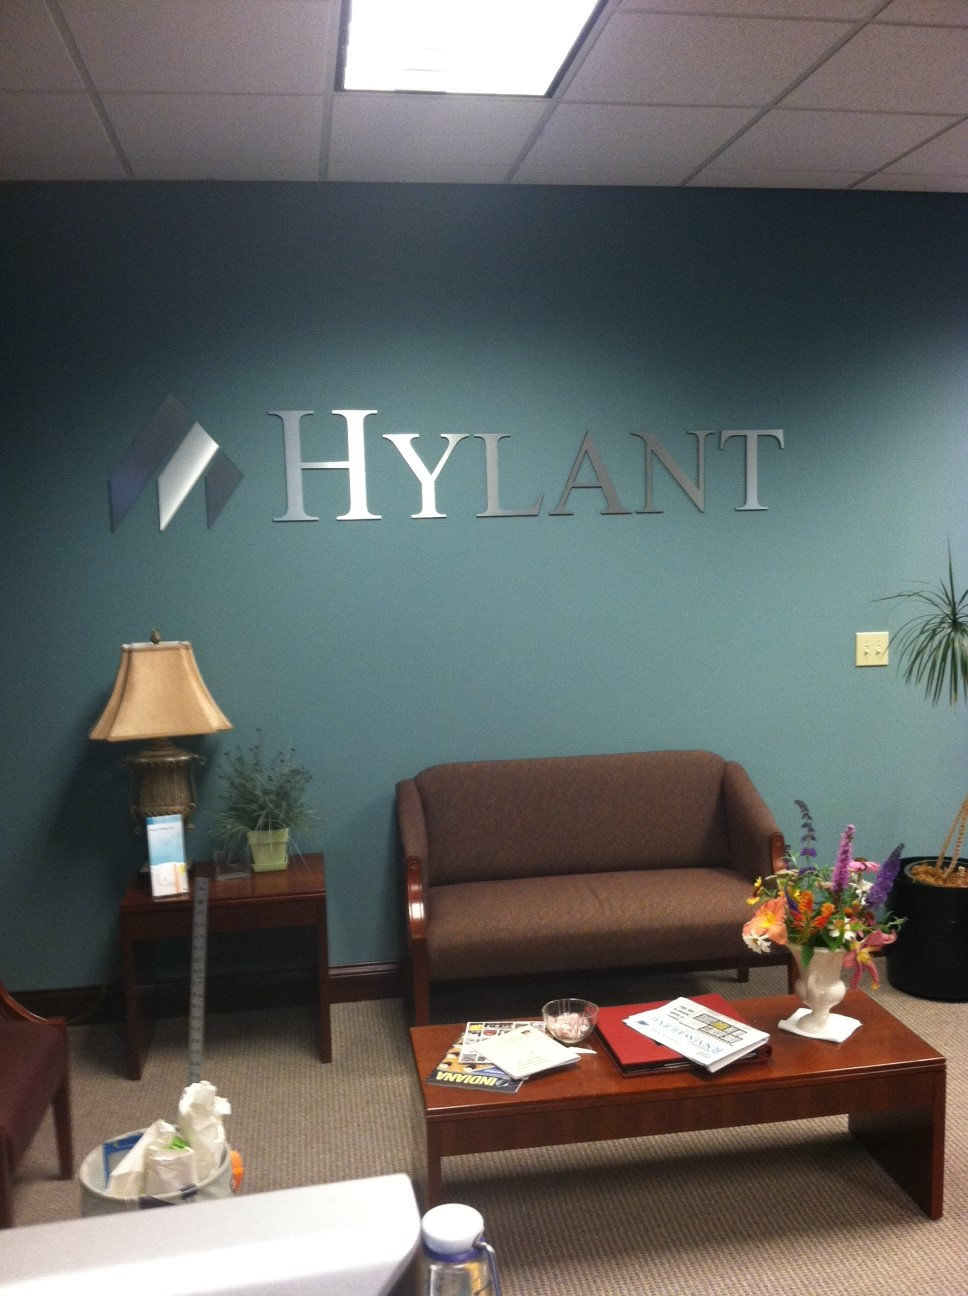 Interior Signs - Hylant